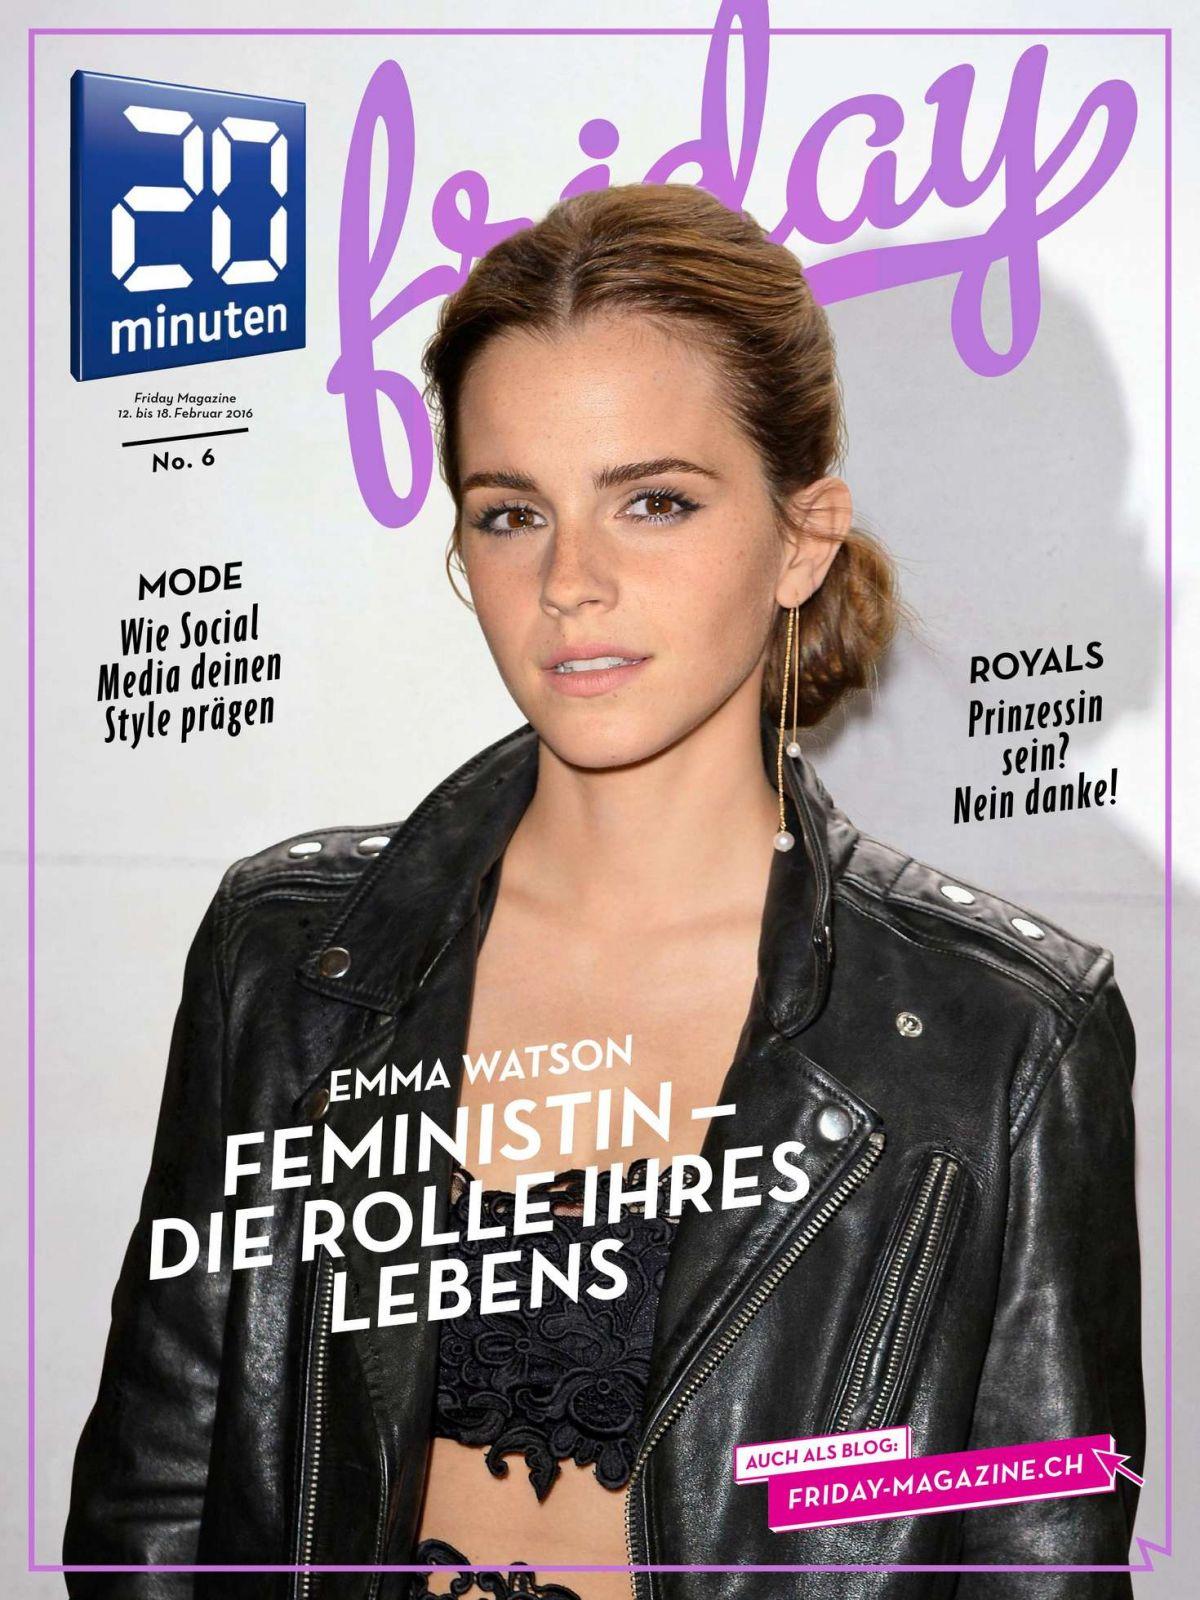 EMMA WATSON in 20 Minuten Friday No. 6, February 2016 Issue